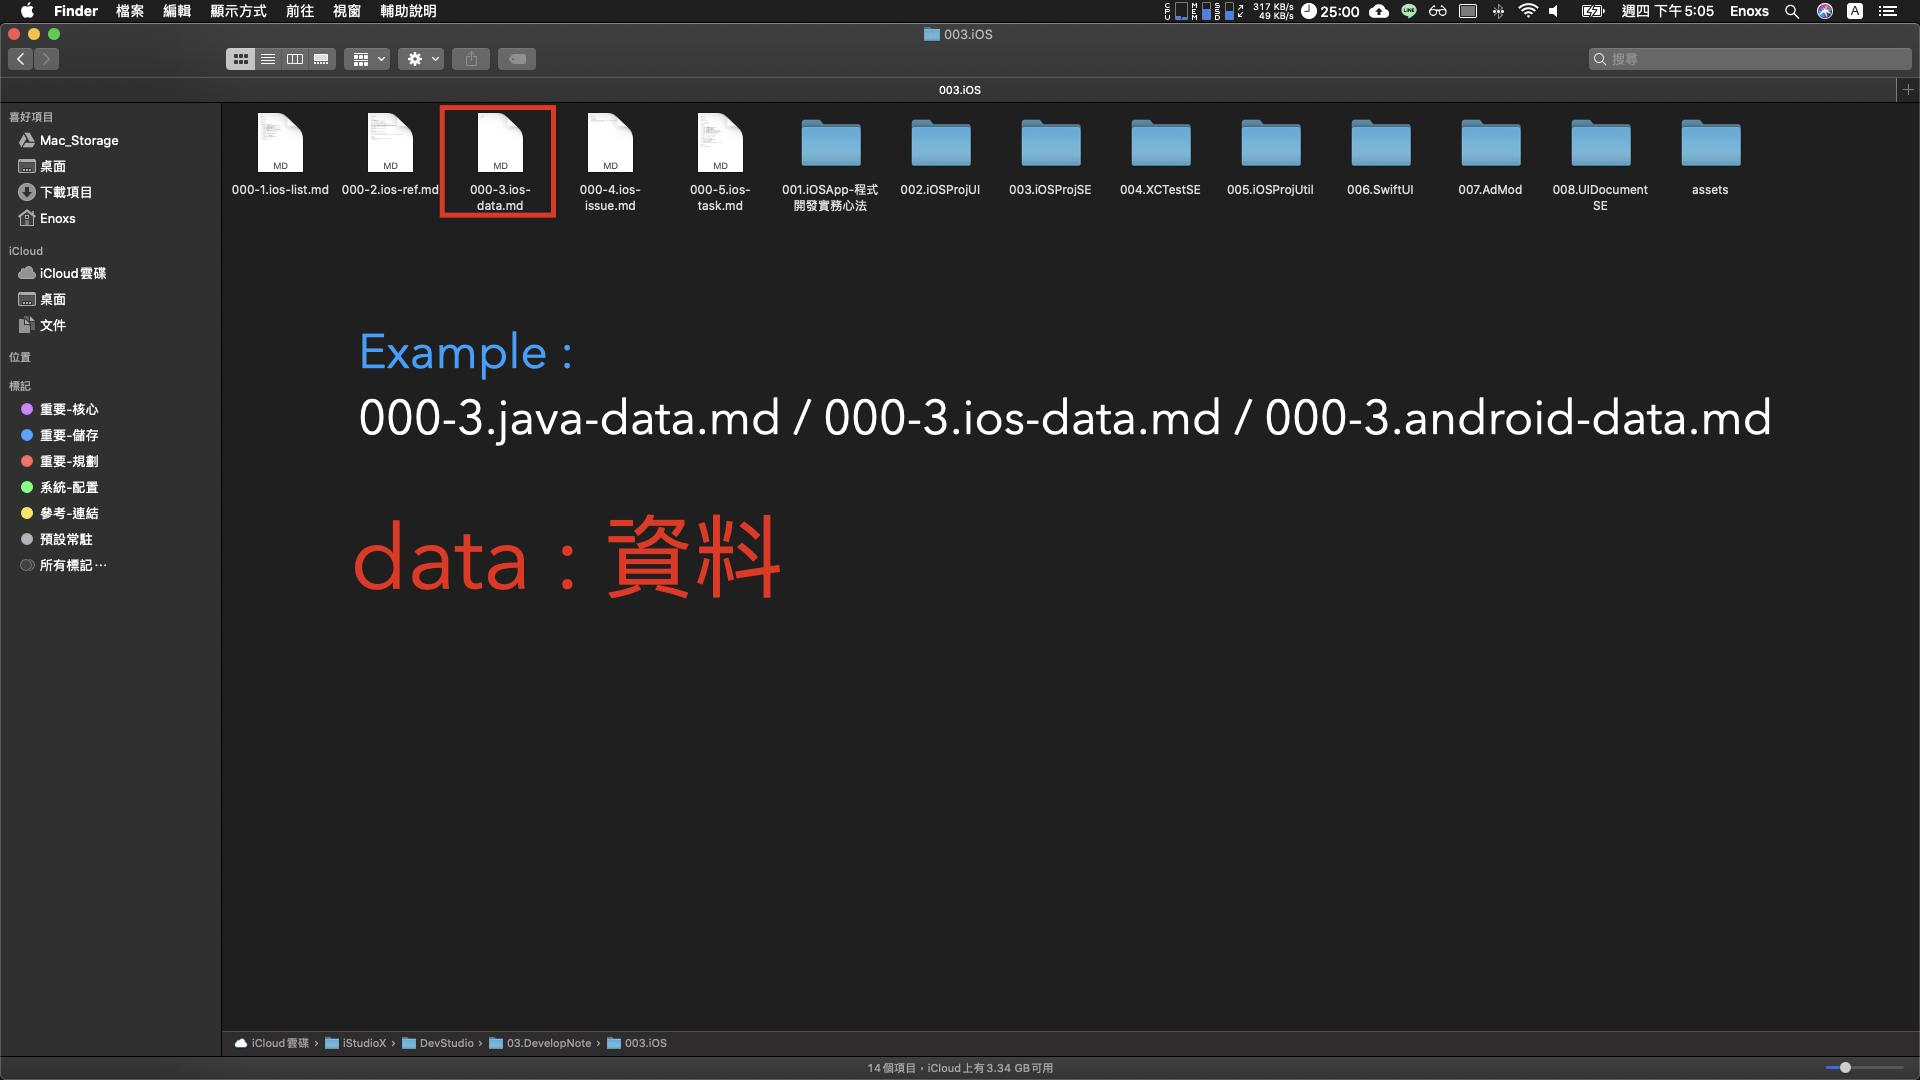 002.data